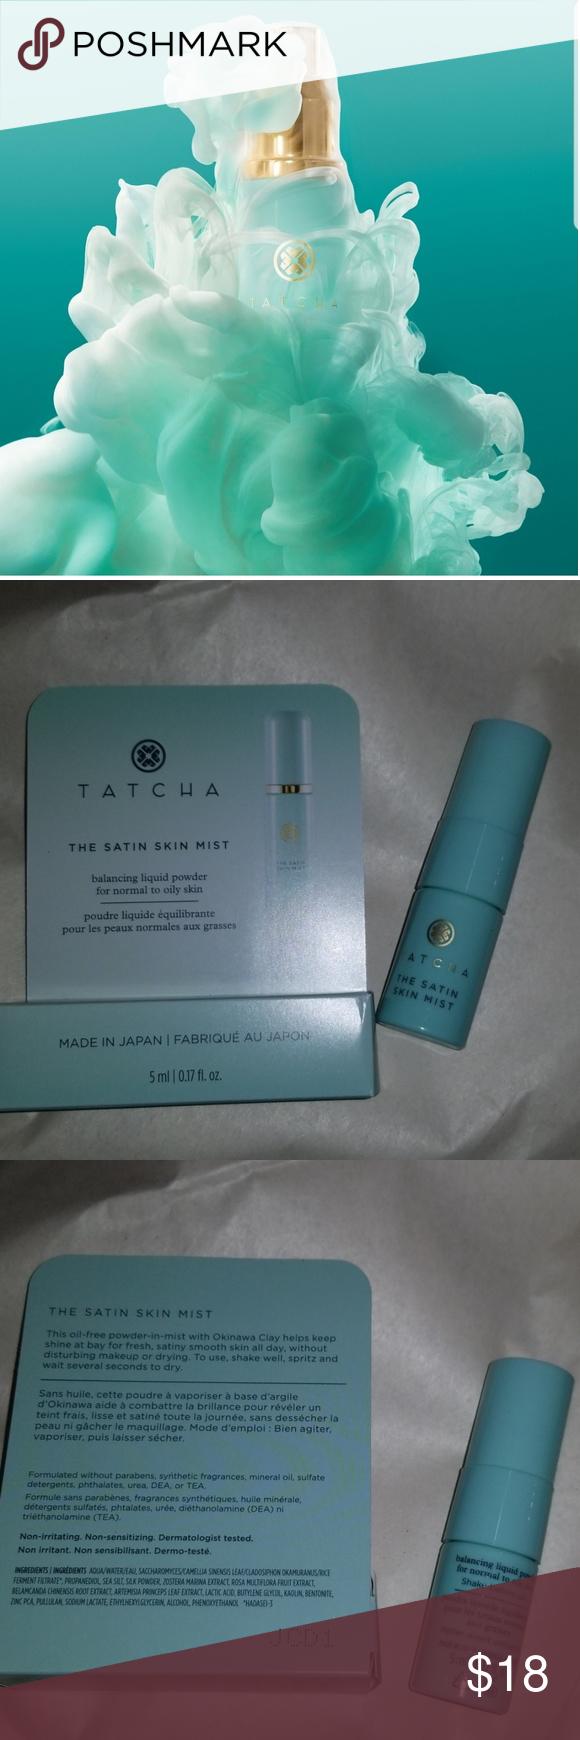 Tatcha The Satin Skinmist Tatcha Face Mist Pure Products